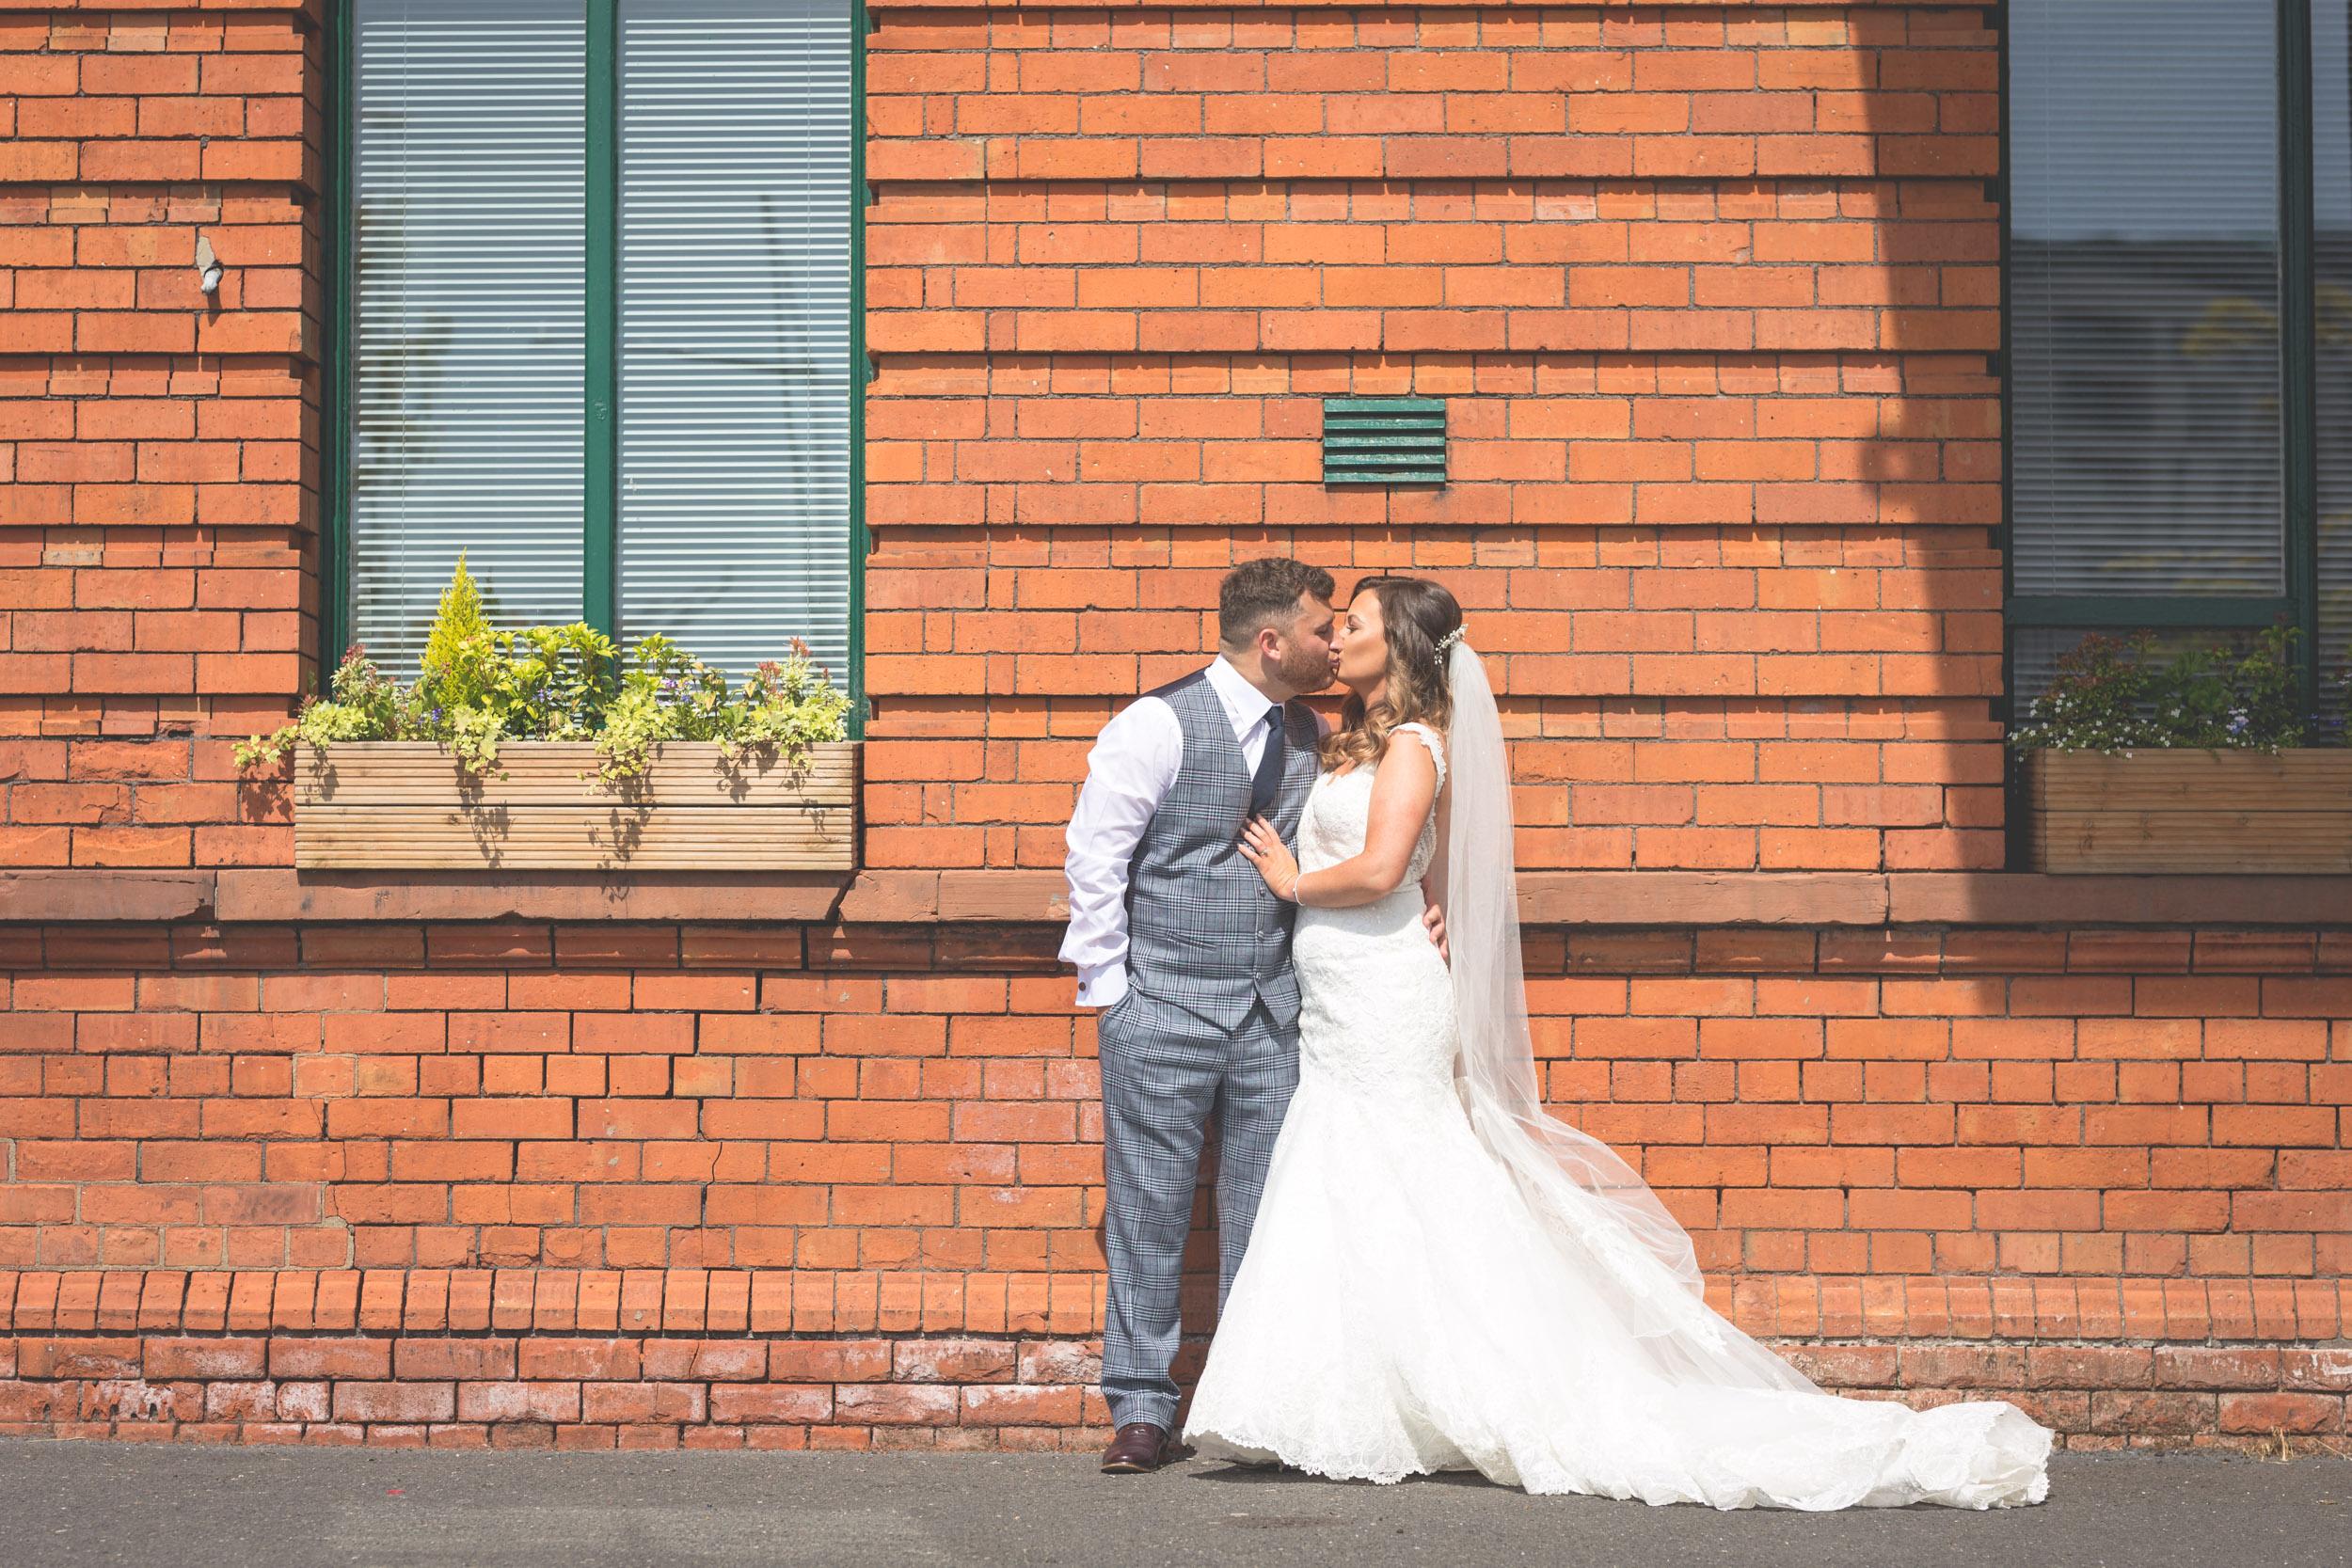 Brian McEwan   Northern Ireland Wedding Photographer   Rebecca & Michael   Portraits-84.jpg